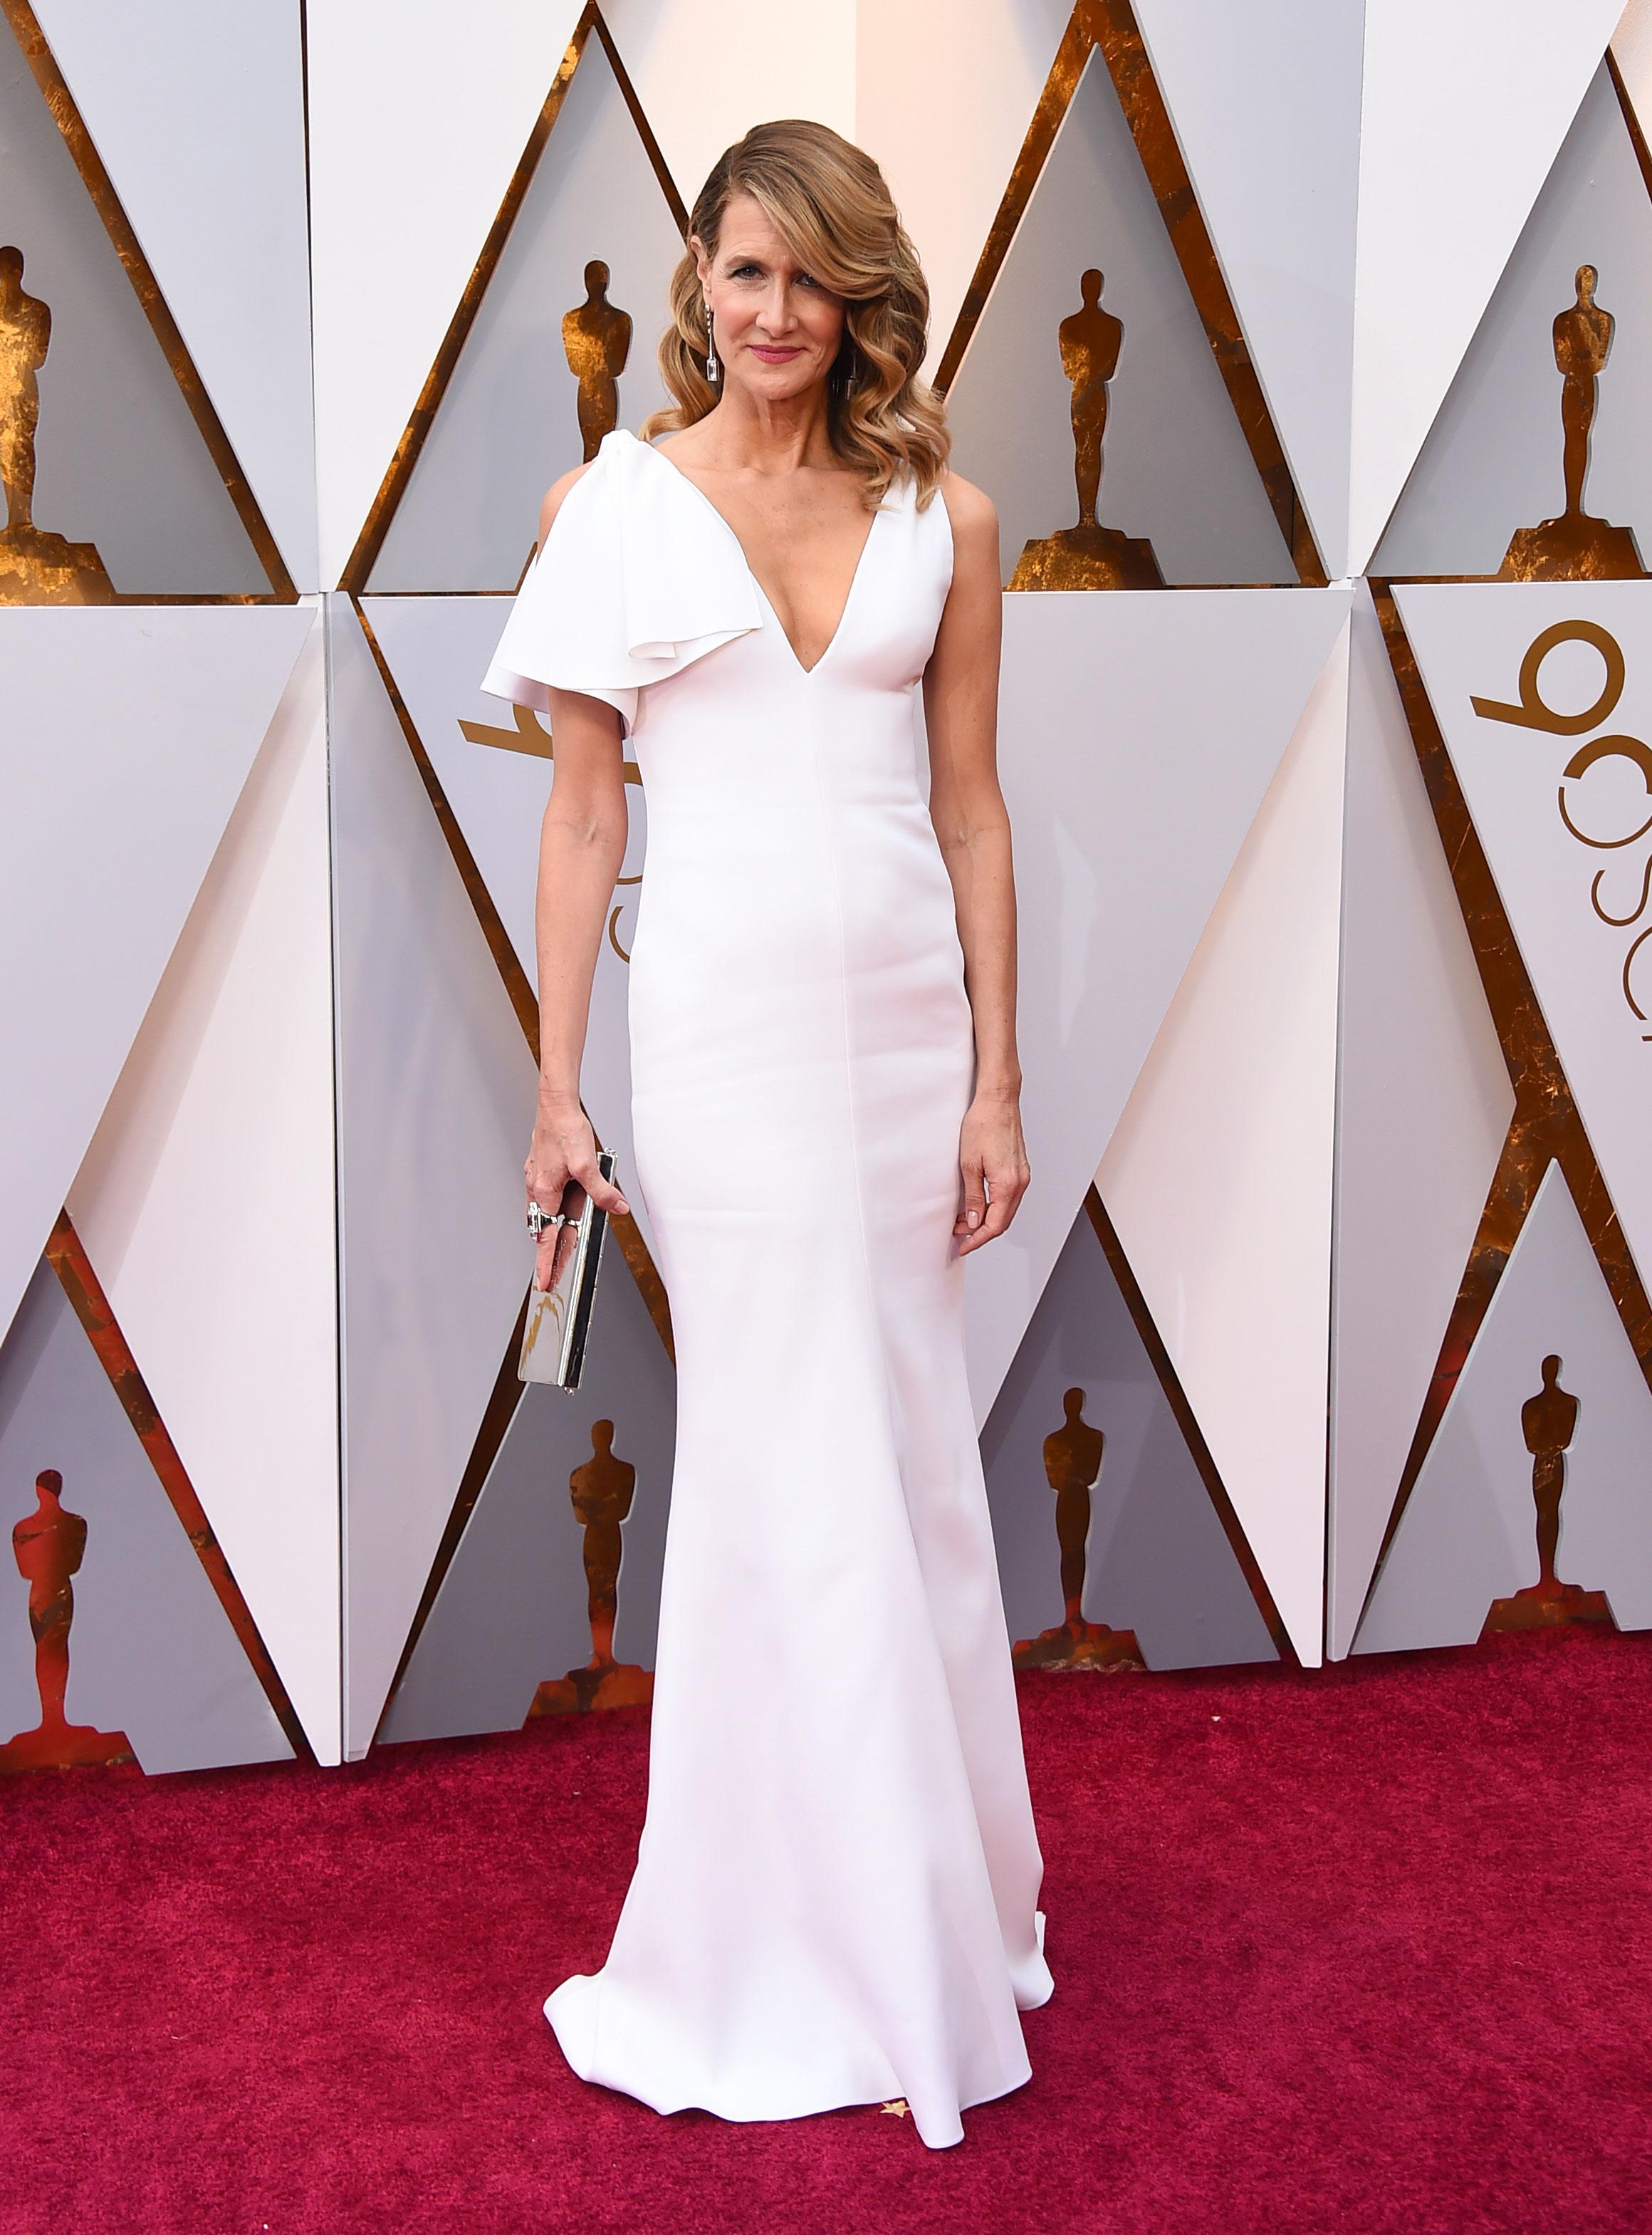 Vestido blanco oscar 2018